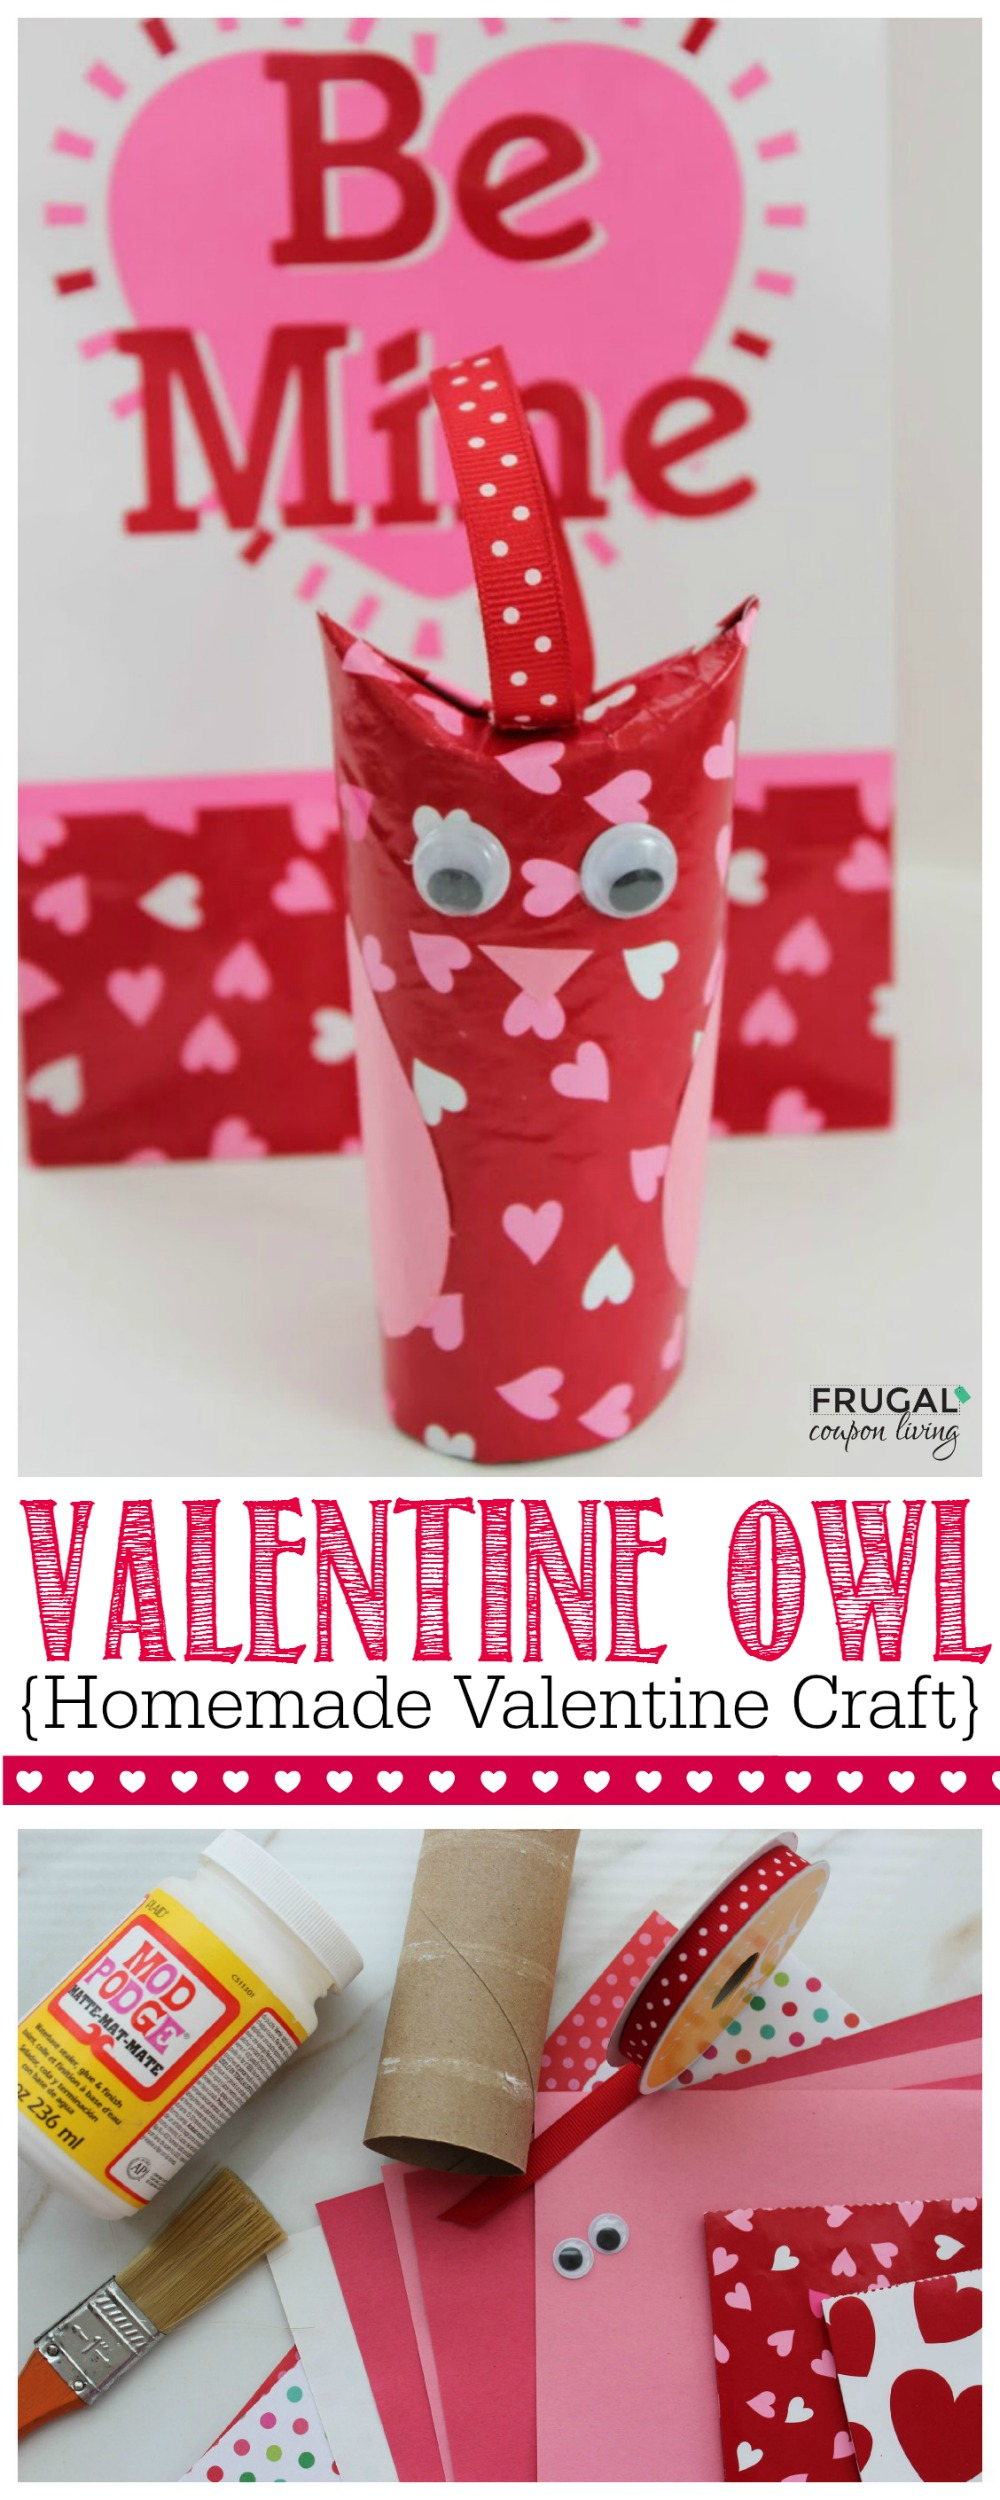 Valentine-Owl-Frugal-Coupon-Living